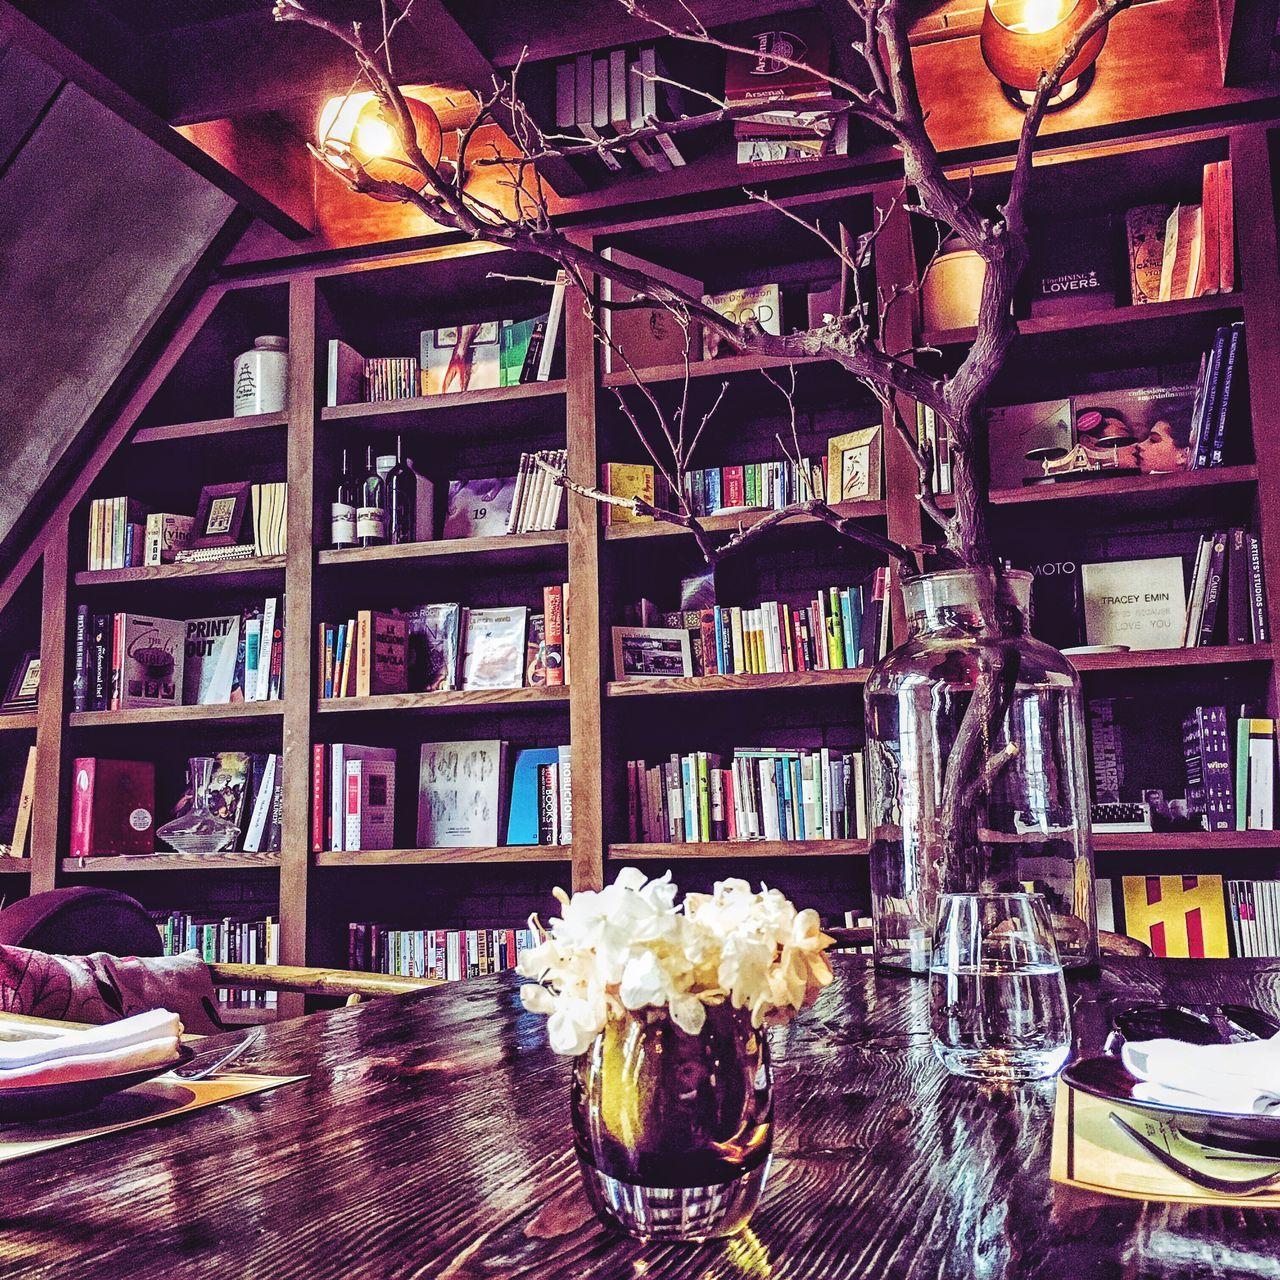 bookshelf, shelf, book, indoors, library, no people, illuminated, day